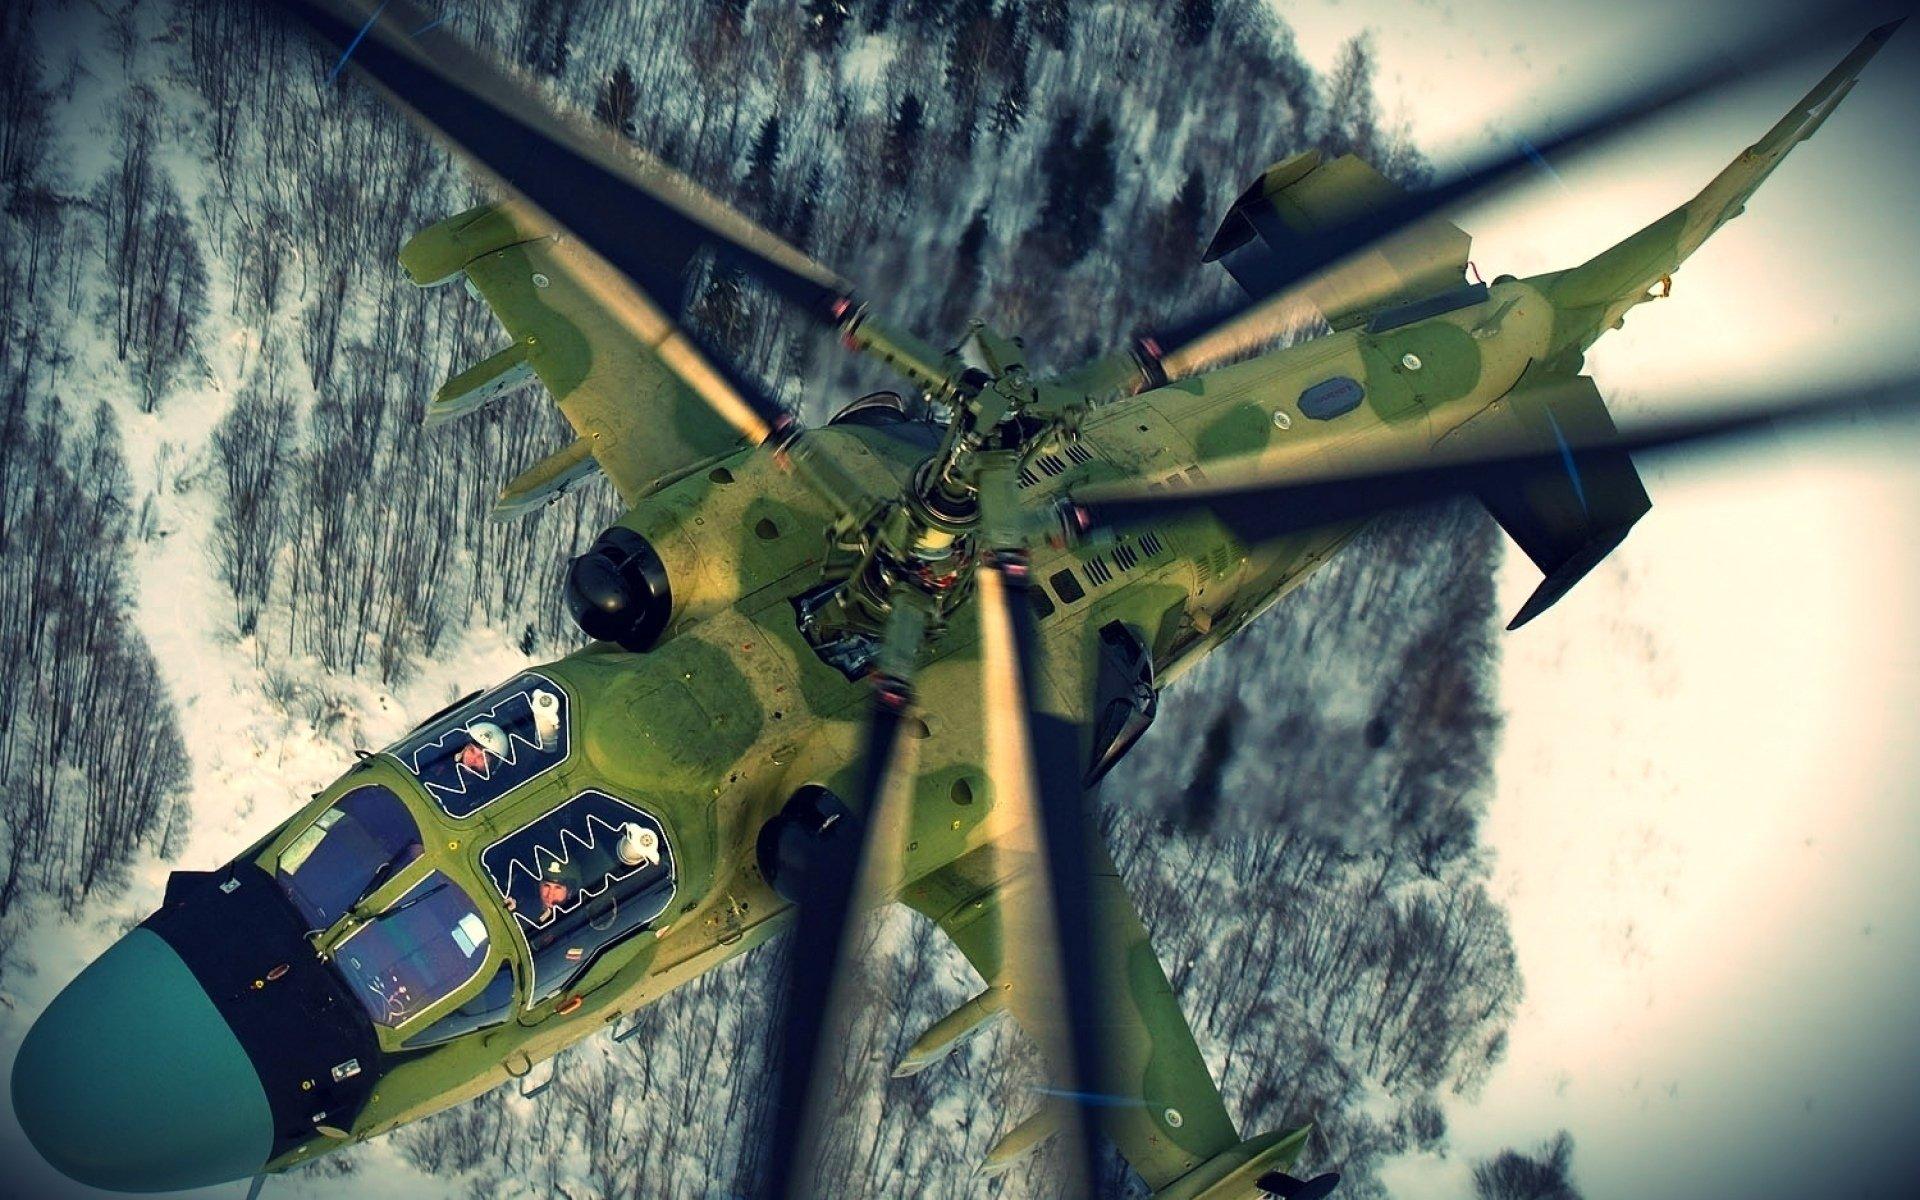 Military - Kamov Ka-52 Alligator  Russian Russia Aircraft Wallpaper